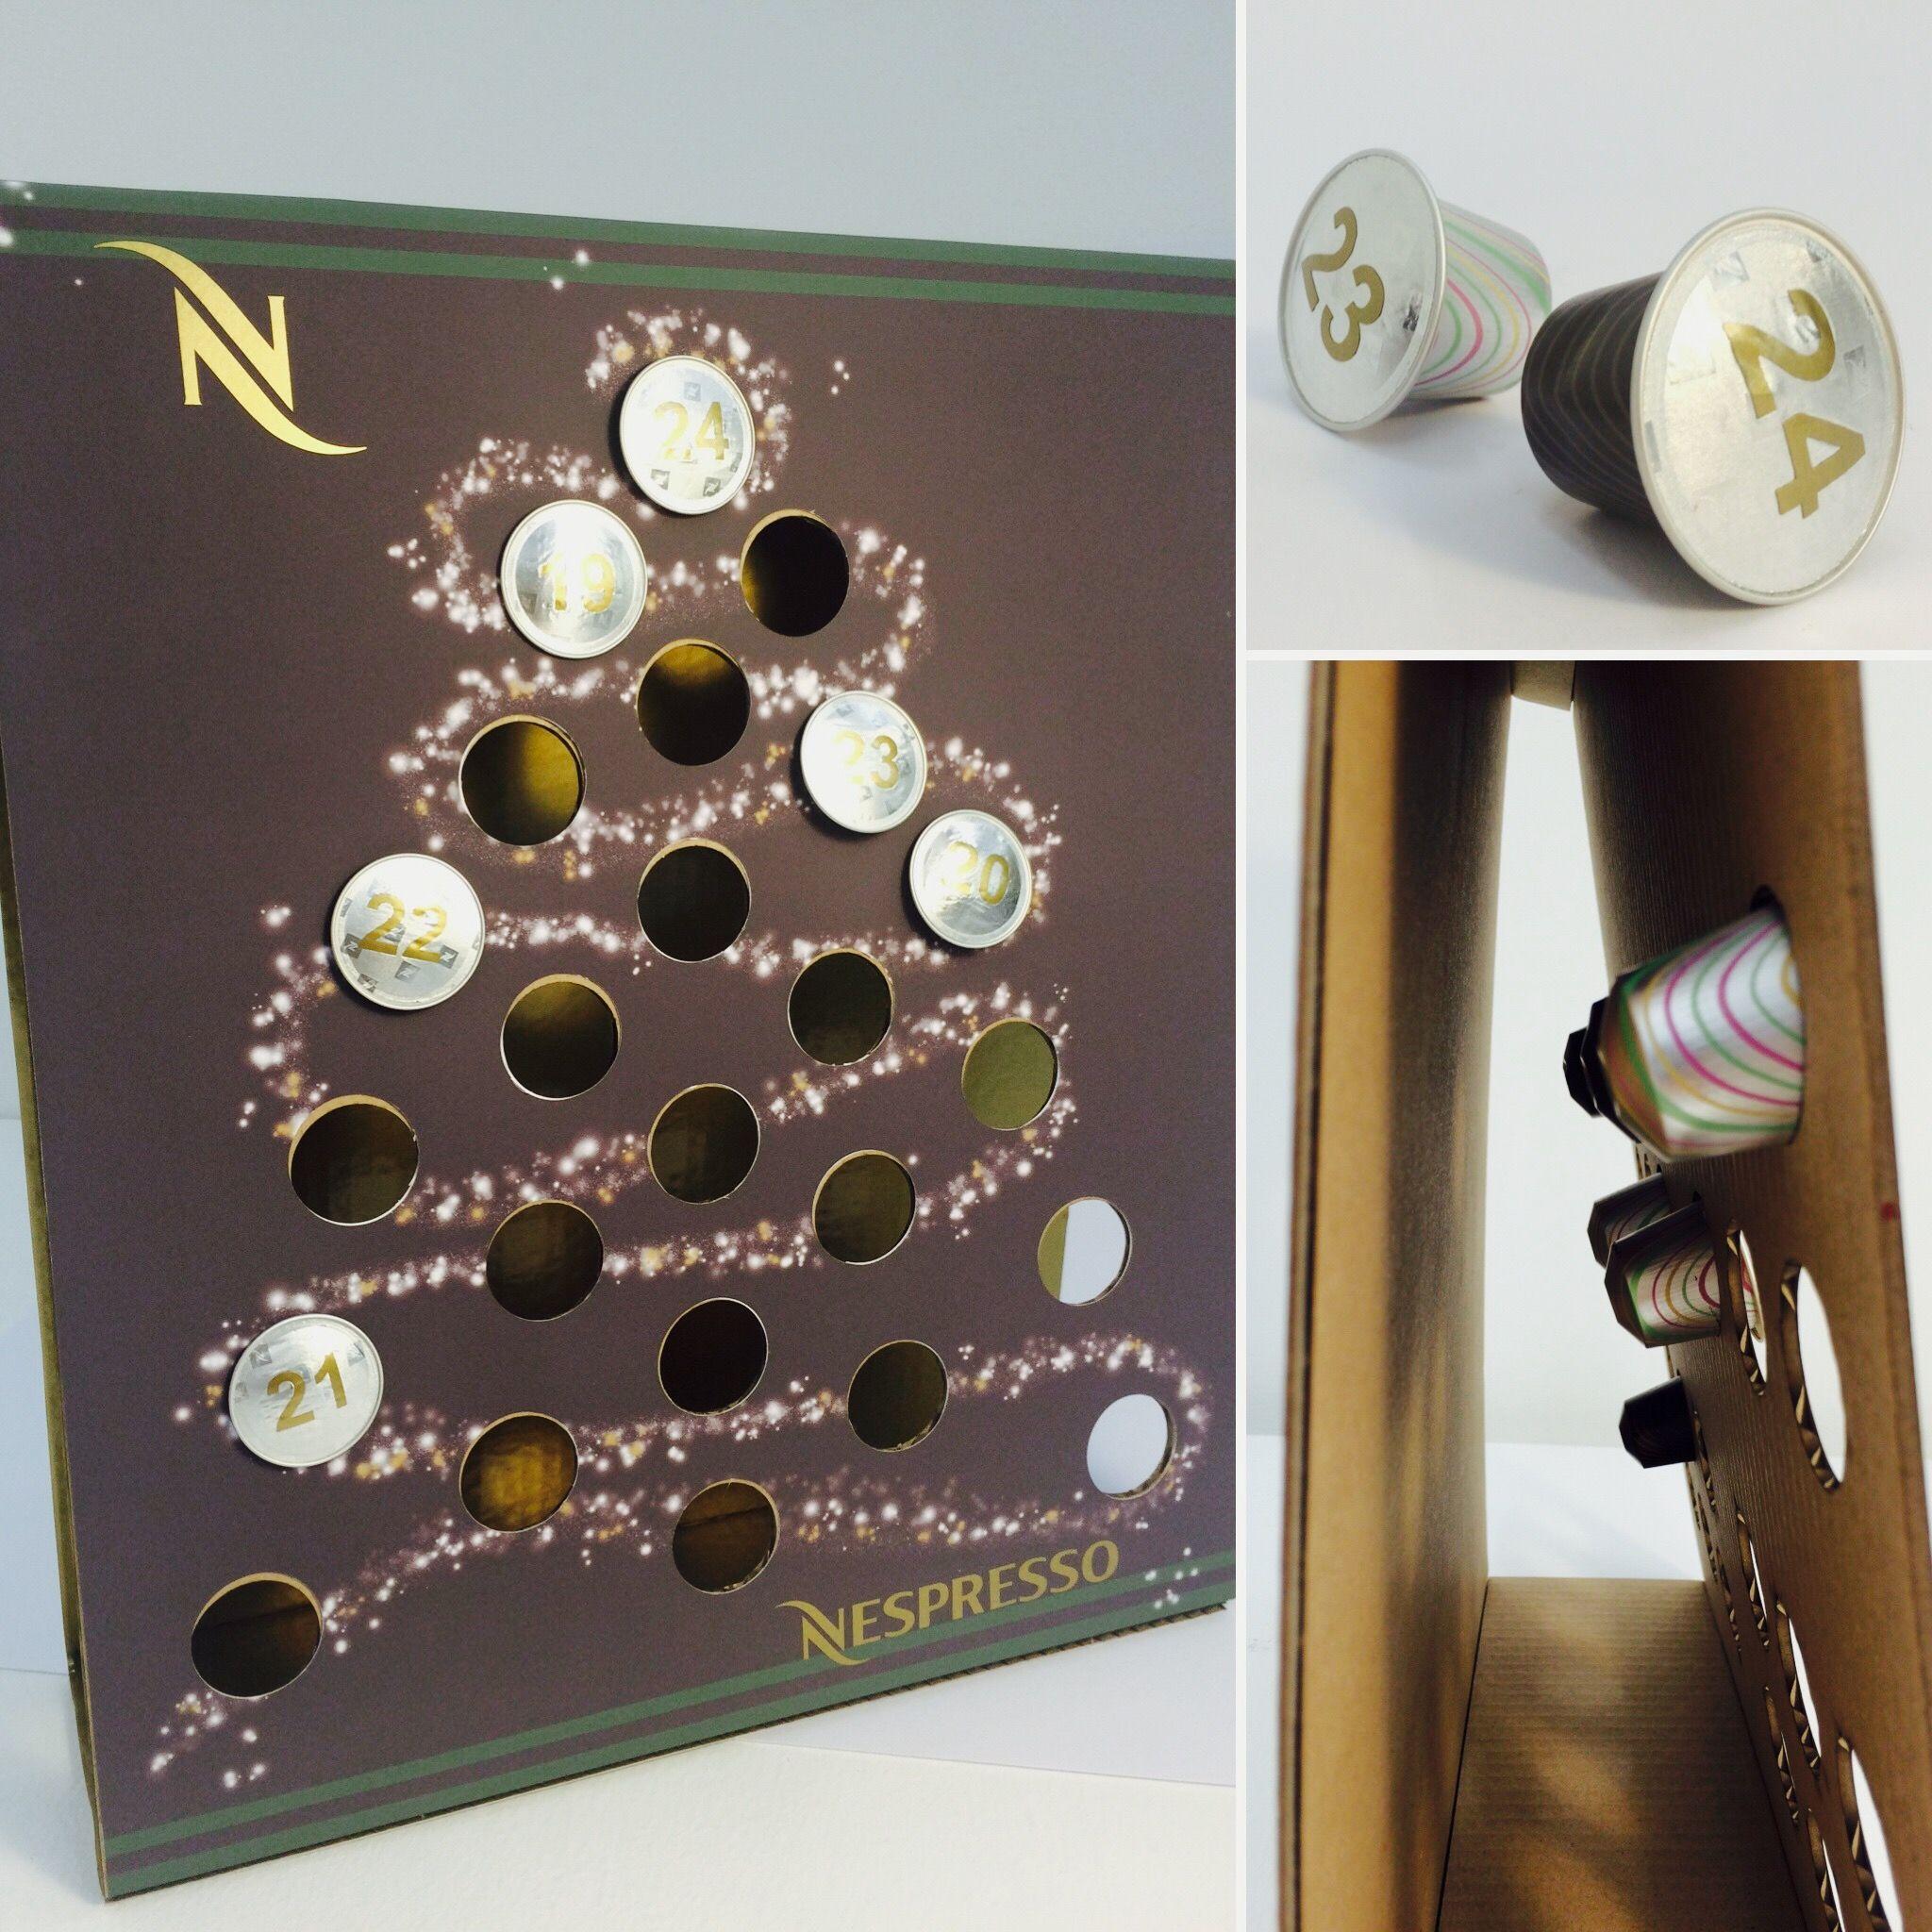 Nespresso Advent Calendar - Designed By Zoe McClatchey for the ...